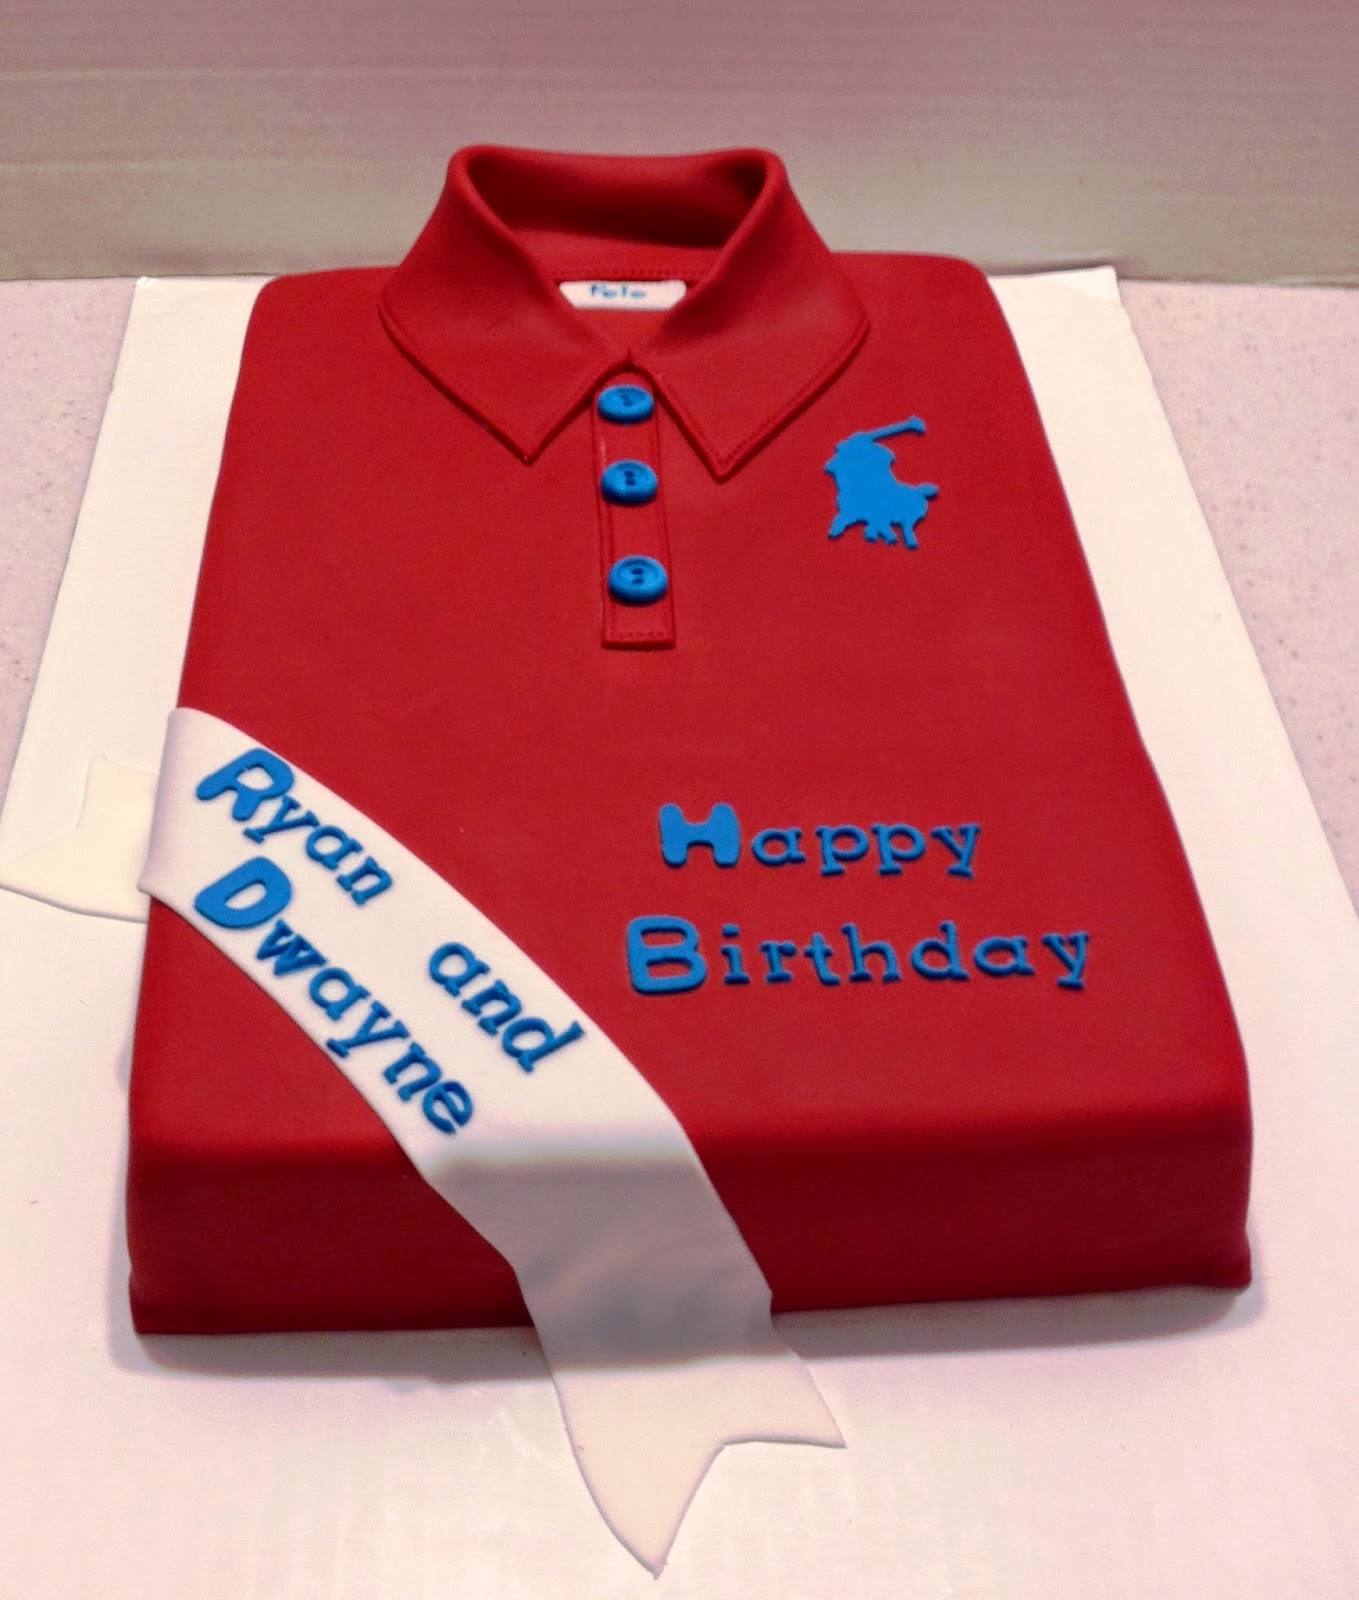 Cake Polo Shirt Design : MaryMel Cakes: Polo shirt double birthdays